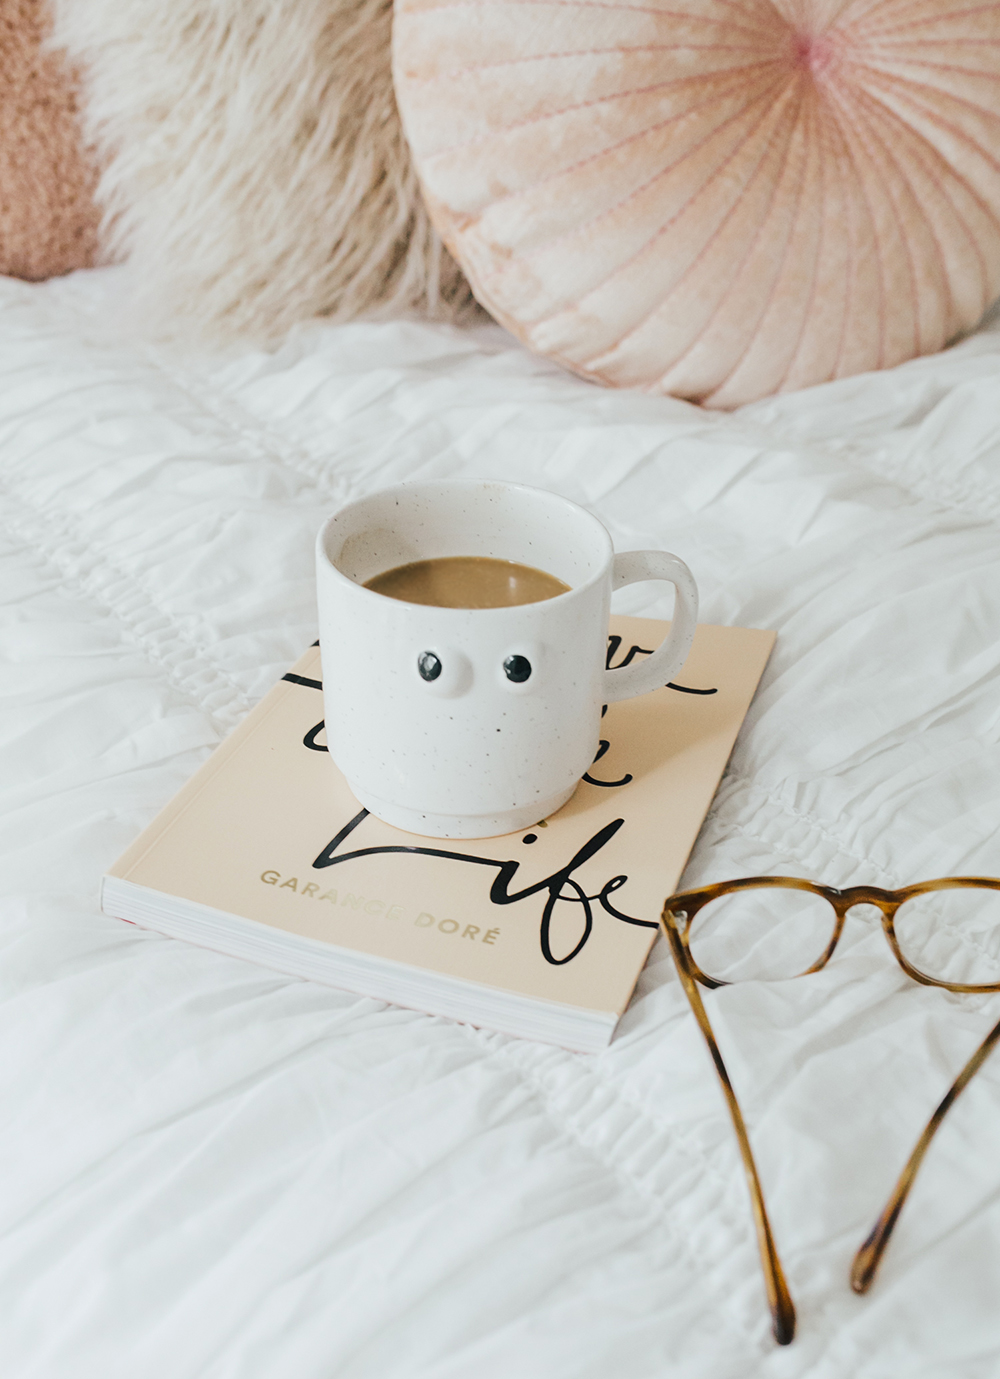 livvyland-blog-olivia-watson-bedroom-bedding-decor-decoration-blush-white-interiors-urban-outfitters-7